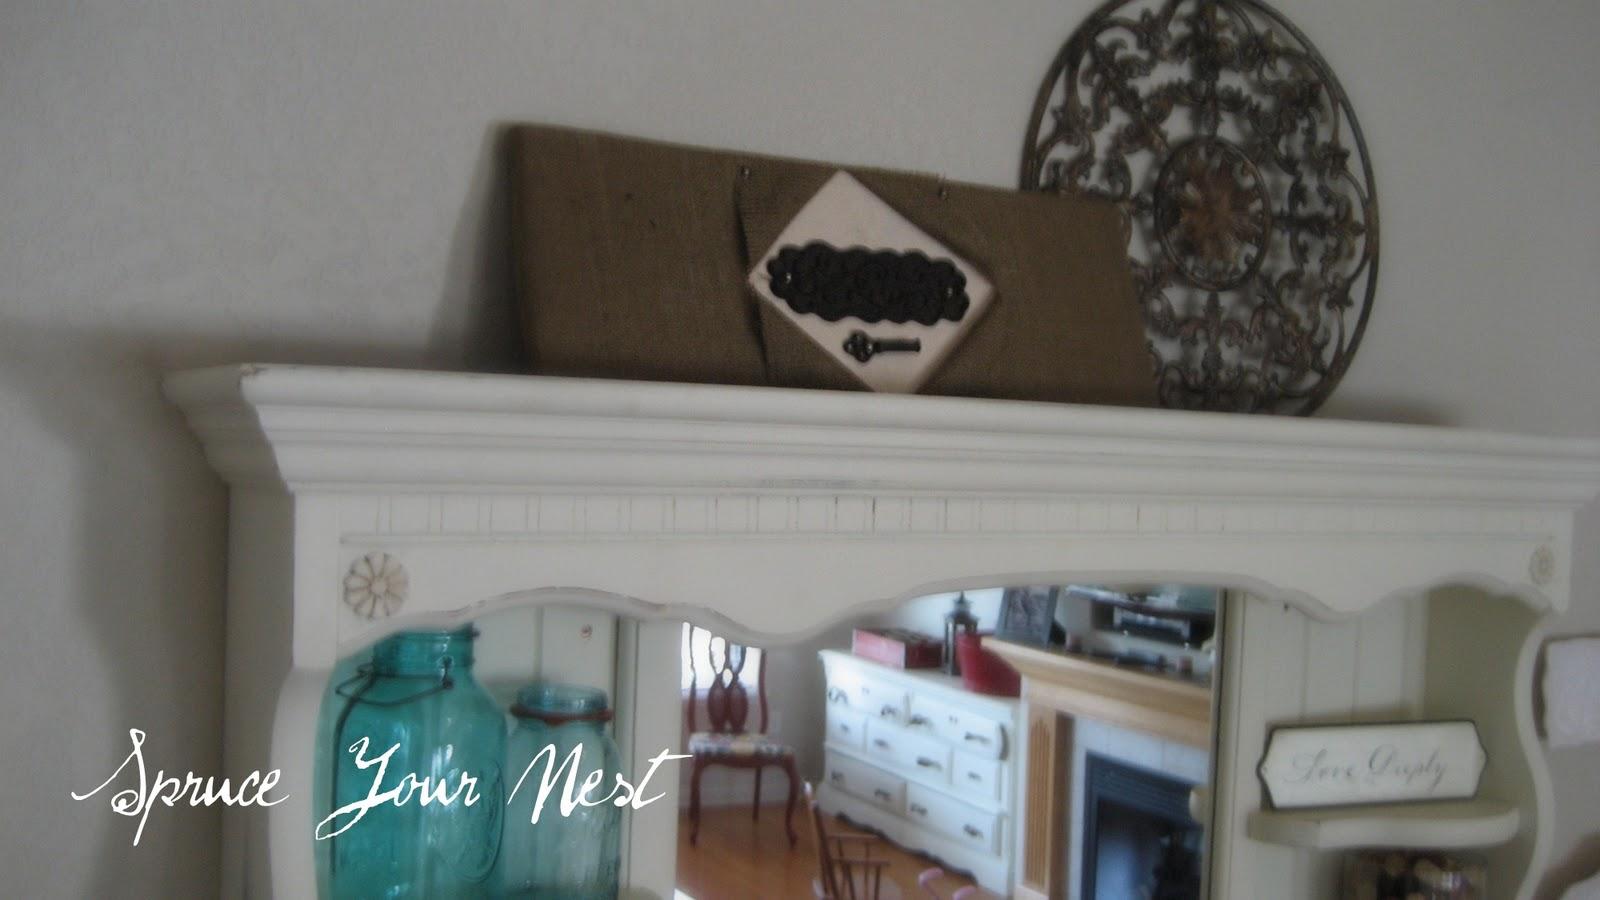 Wall Decor Ross : Spruce your nest burlap art